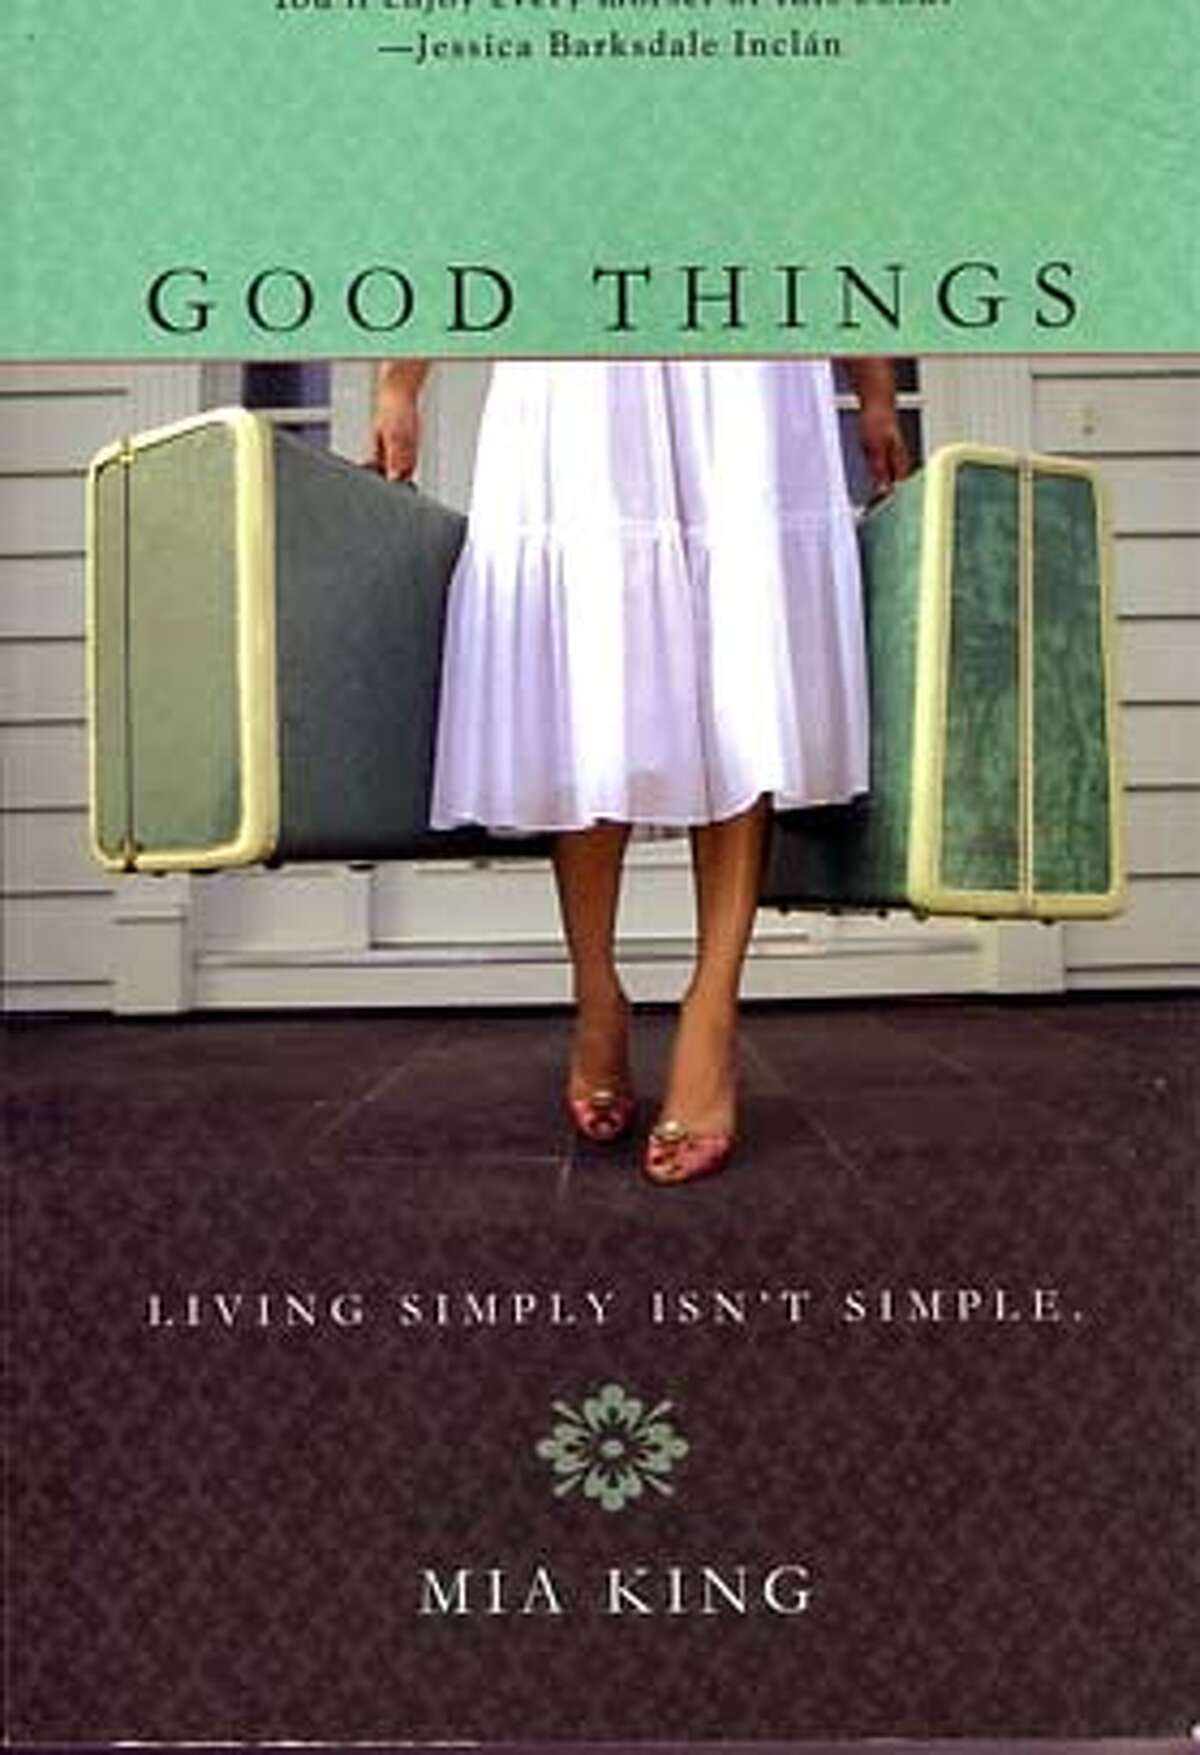 """Good Things"" by Darien Hsu Gee (writing as Mia King)"